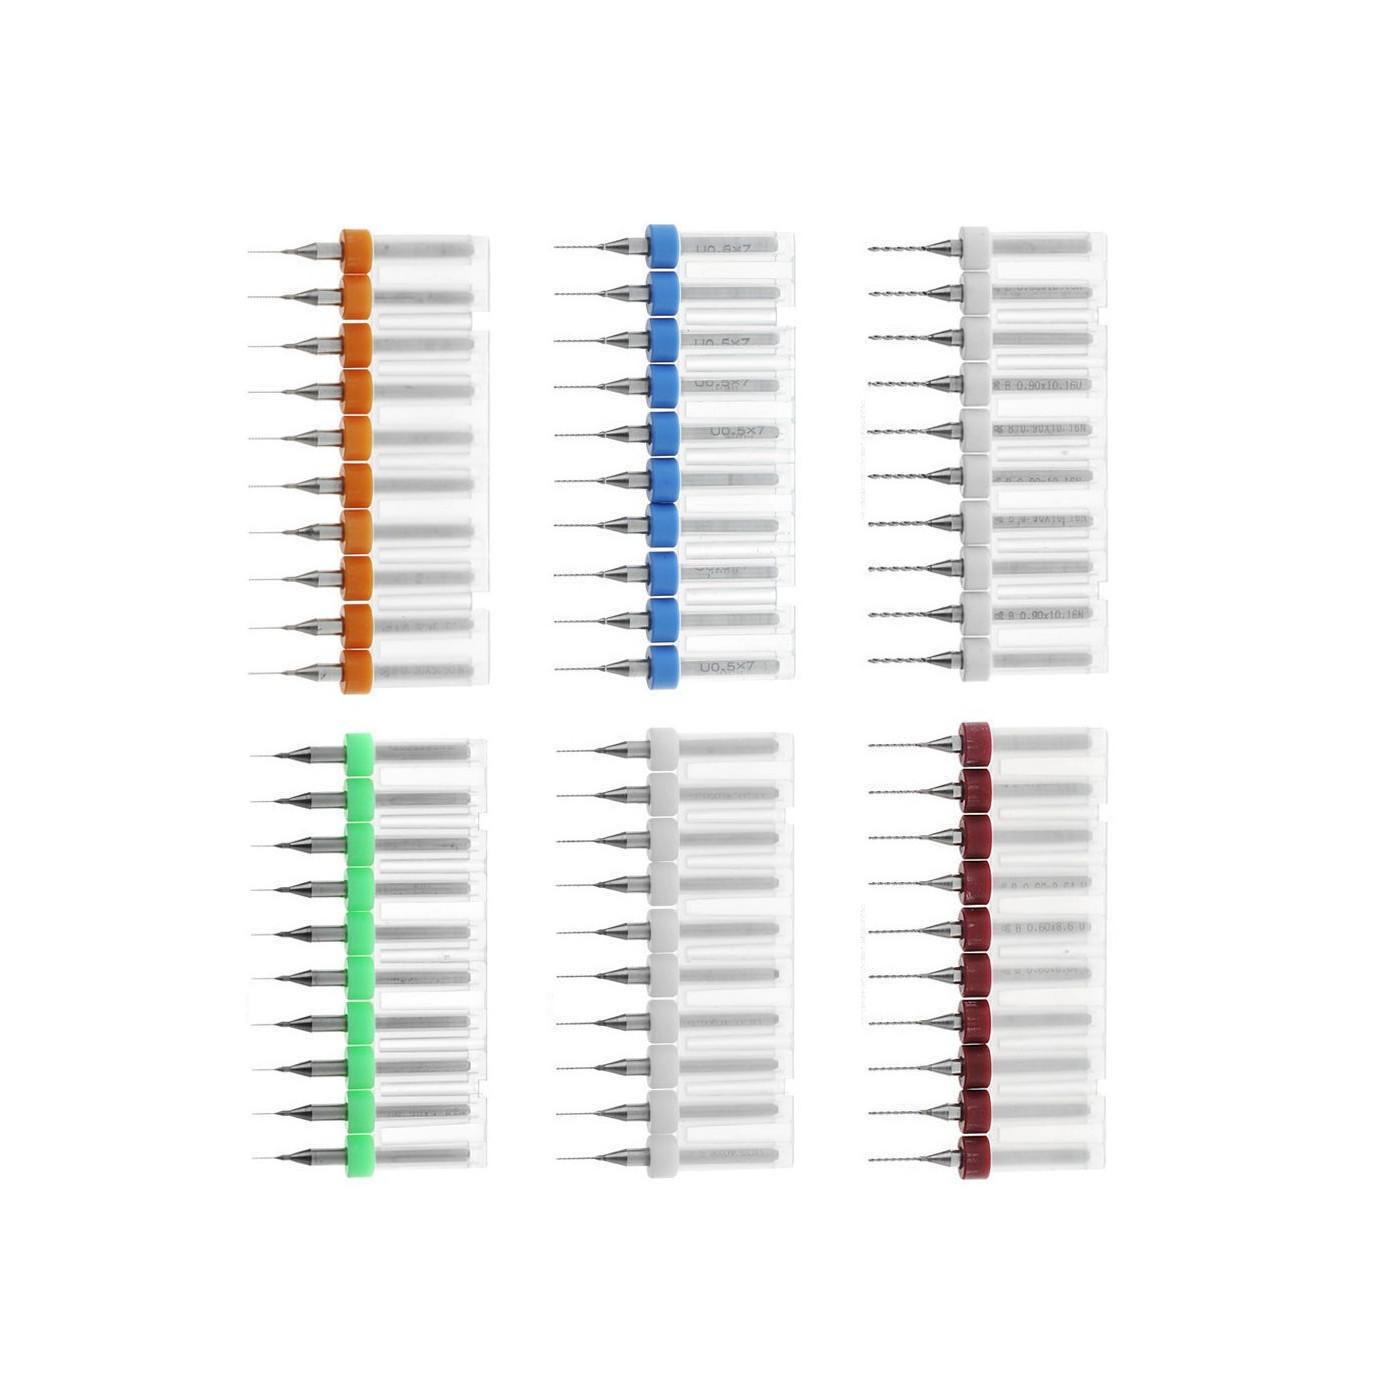 Combi set of 10 micro drill bits in box (0.30-1.20 mm)